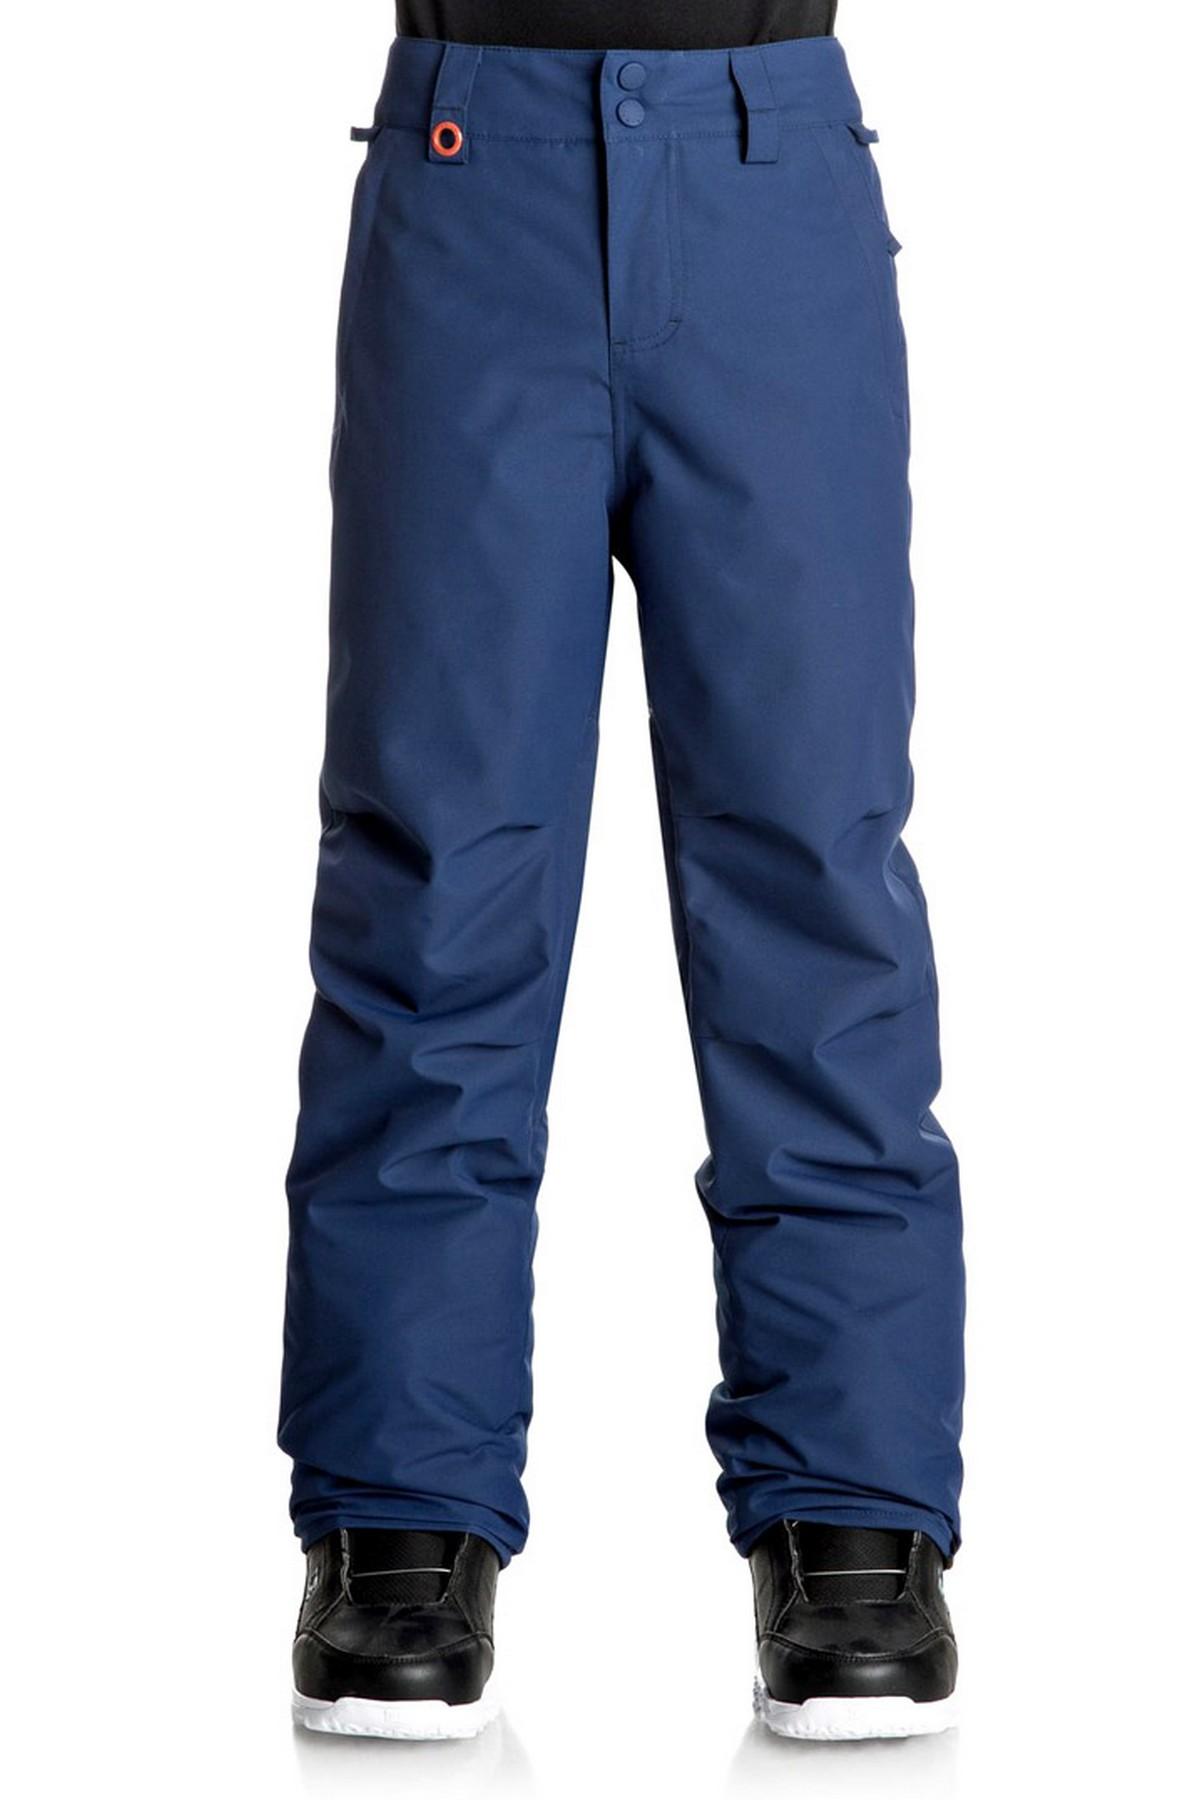 Quiksilver Estate Genç Çocuk Kayak Pantolonu Lacivert (EQBTP03013-BSW0)